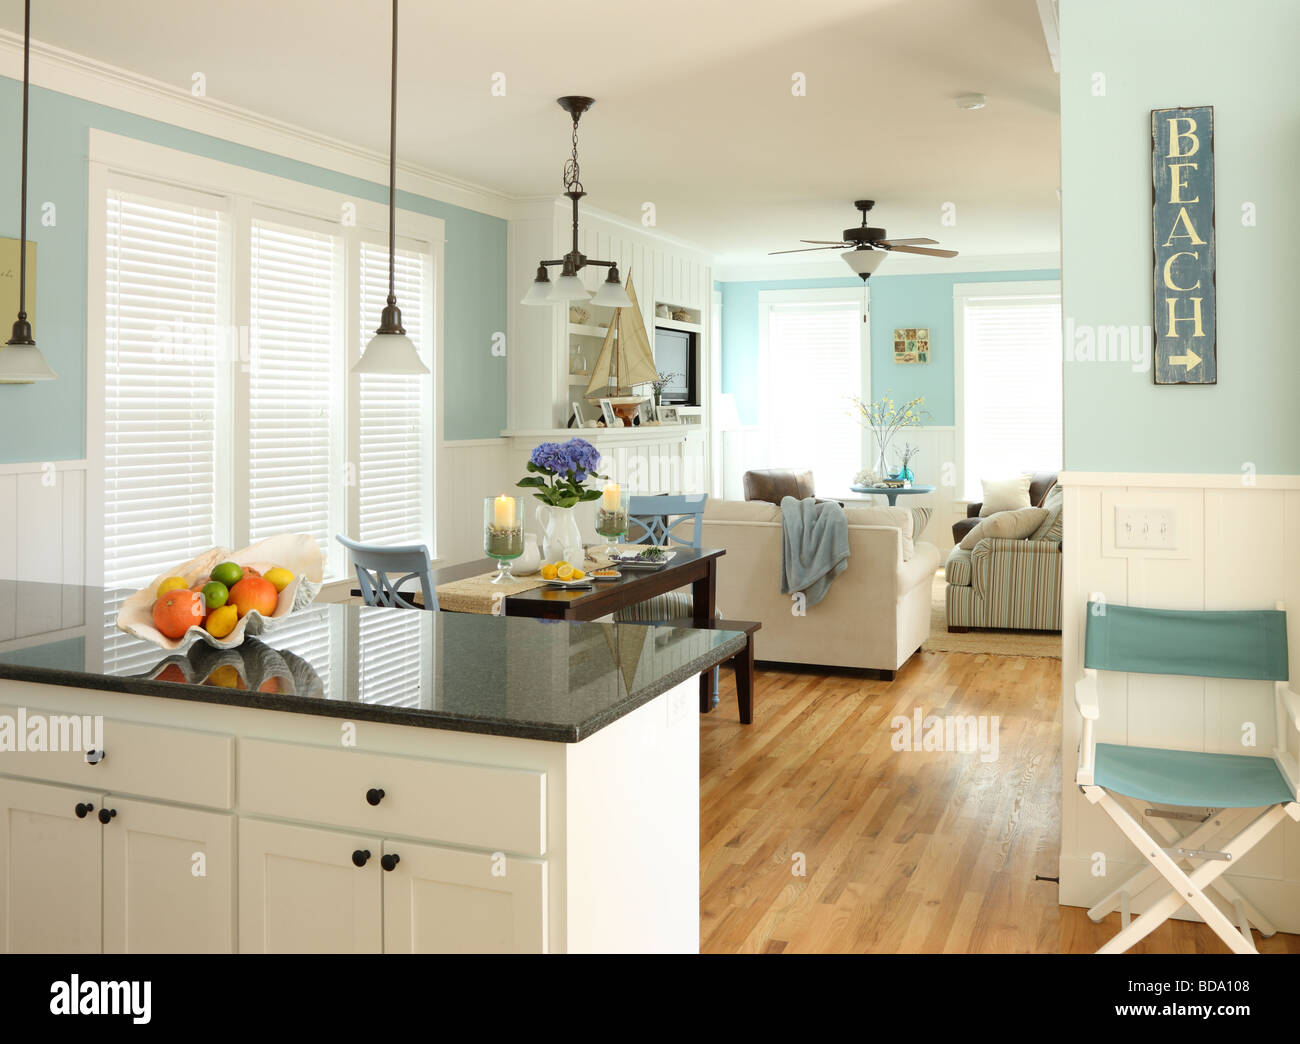 Beach house interior - Stock Image